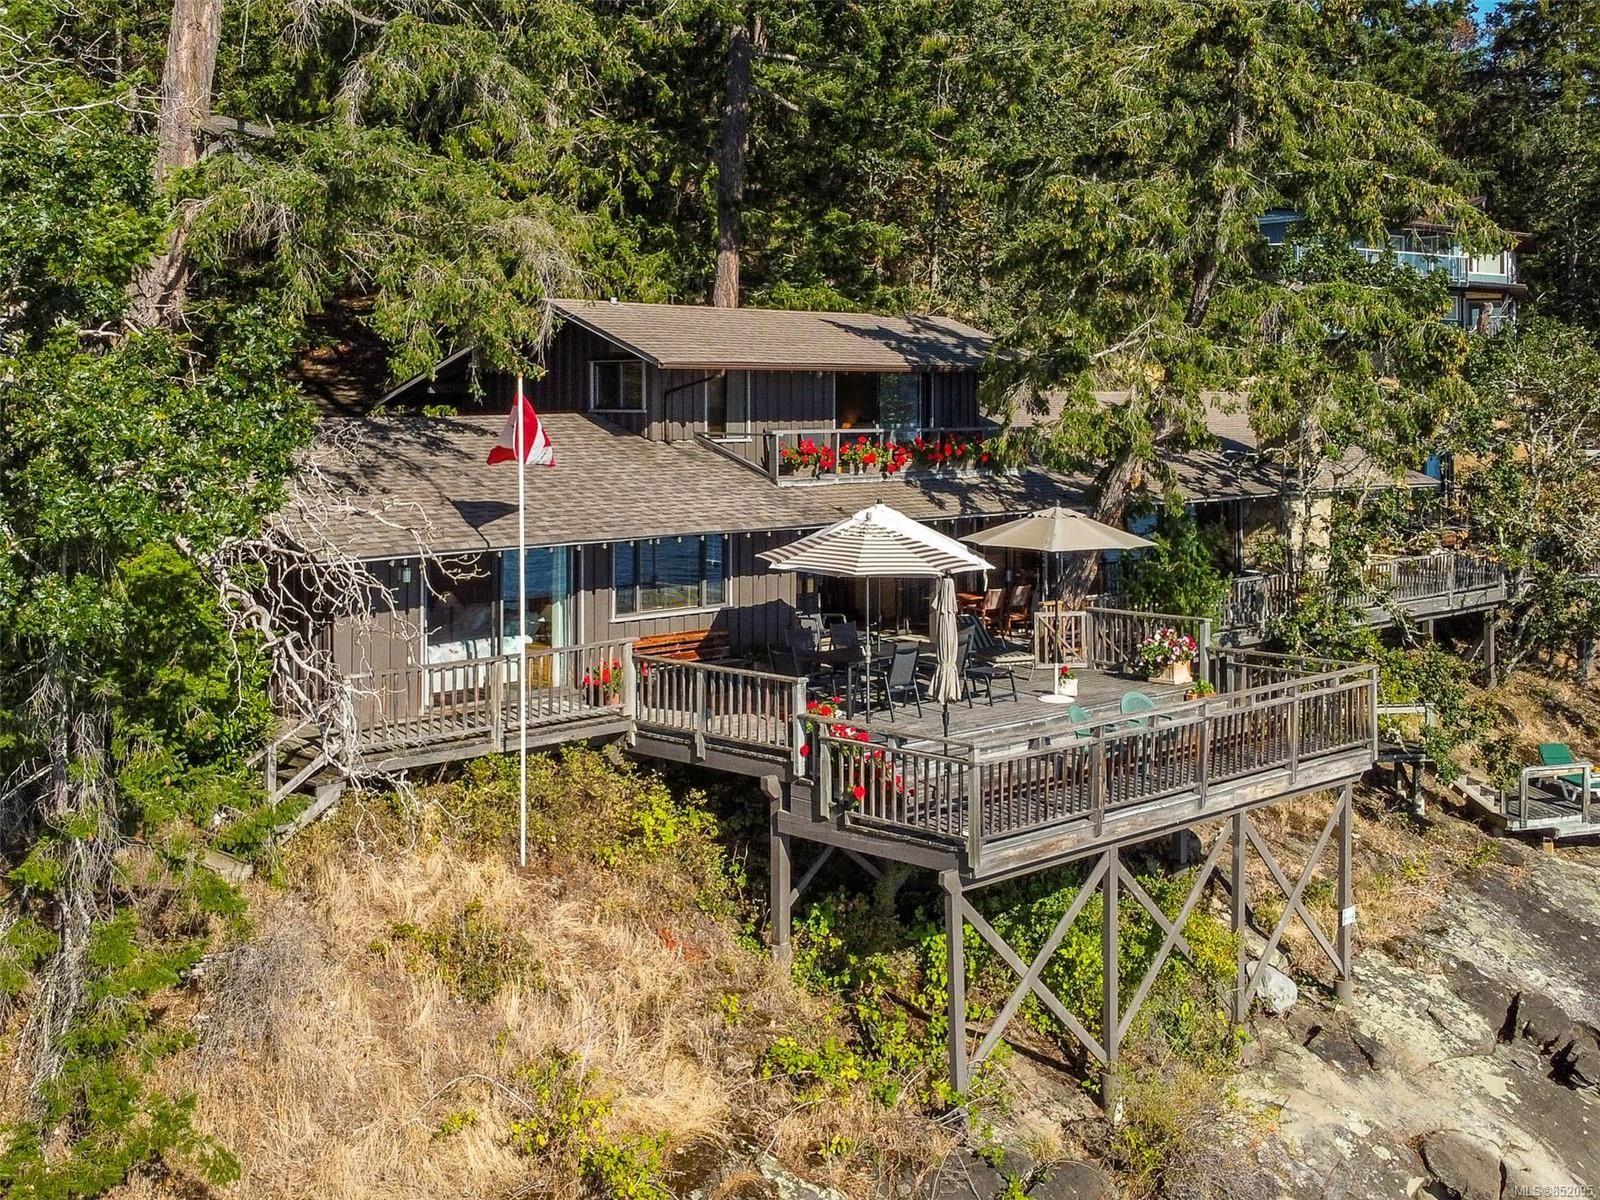 Photo 28: Photos: 236 McGill Rd in : GI Salt Spring House for sale (Gulf Islands)  : MLS®# 852095